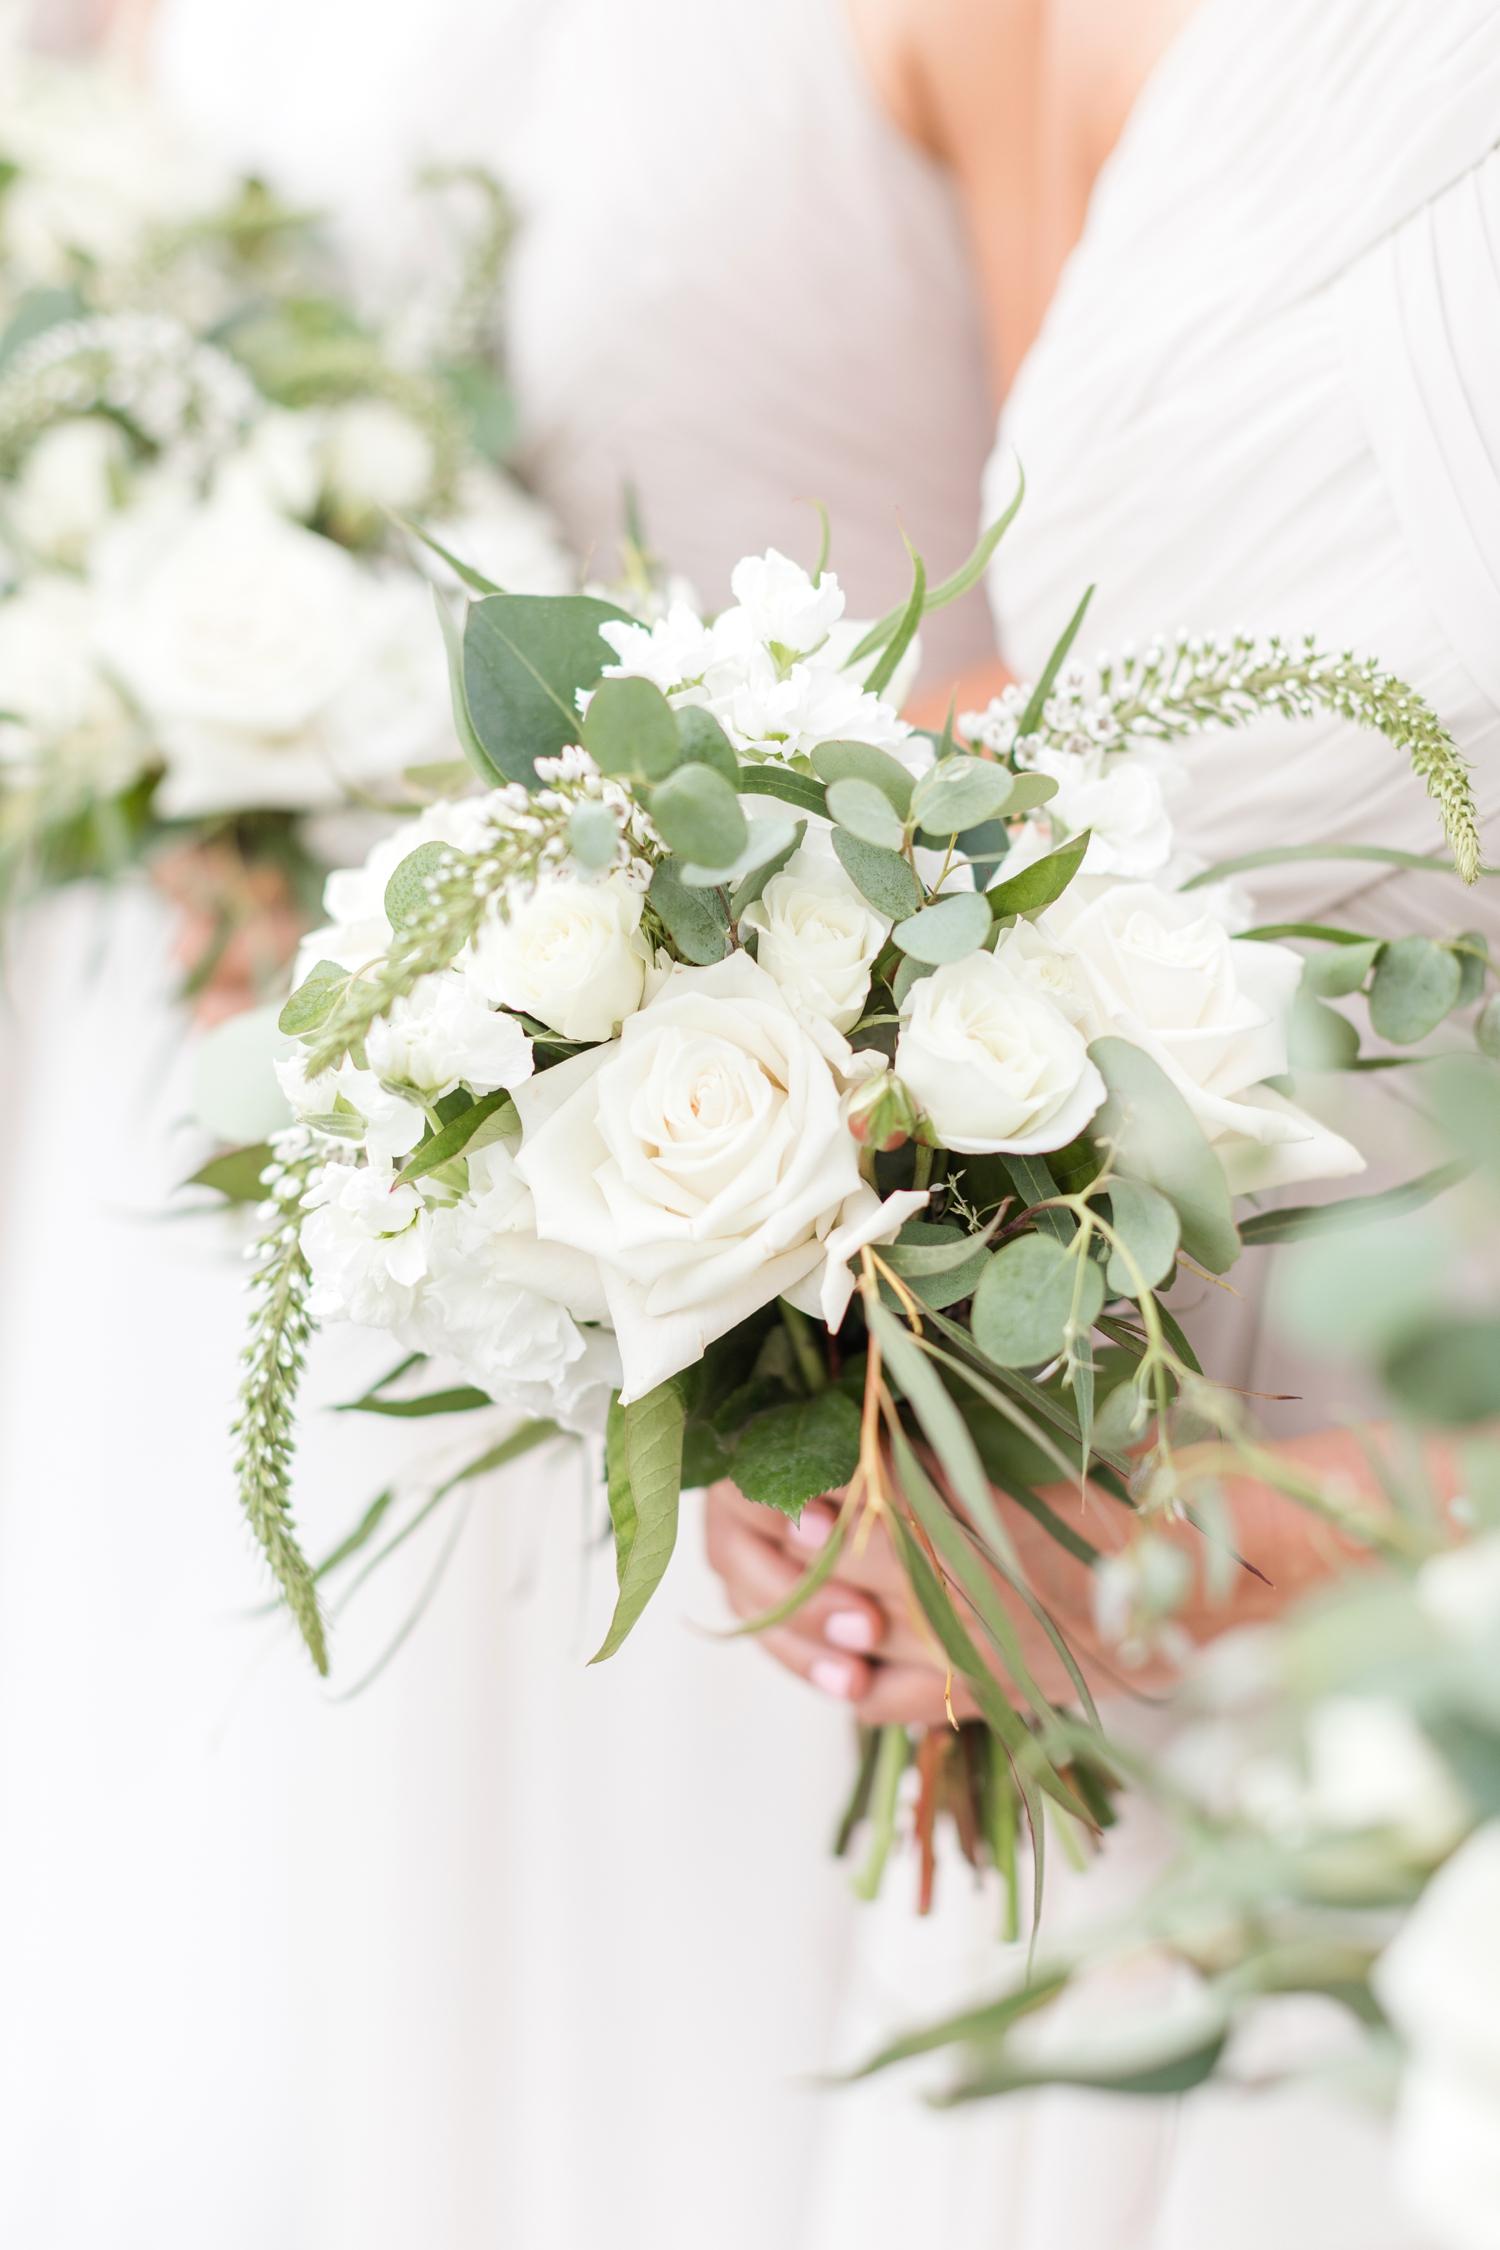 Schindler WEDDING HIGHLIGHTS-204_Herrington-on-the-Bay-wedding-Maryland-wedding-photographer-anna-grace-photography-photo.jpg